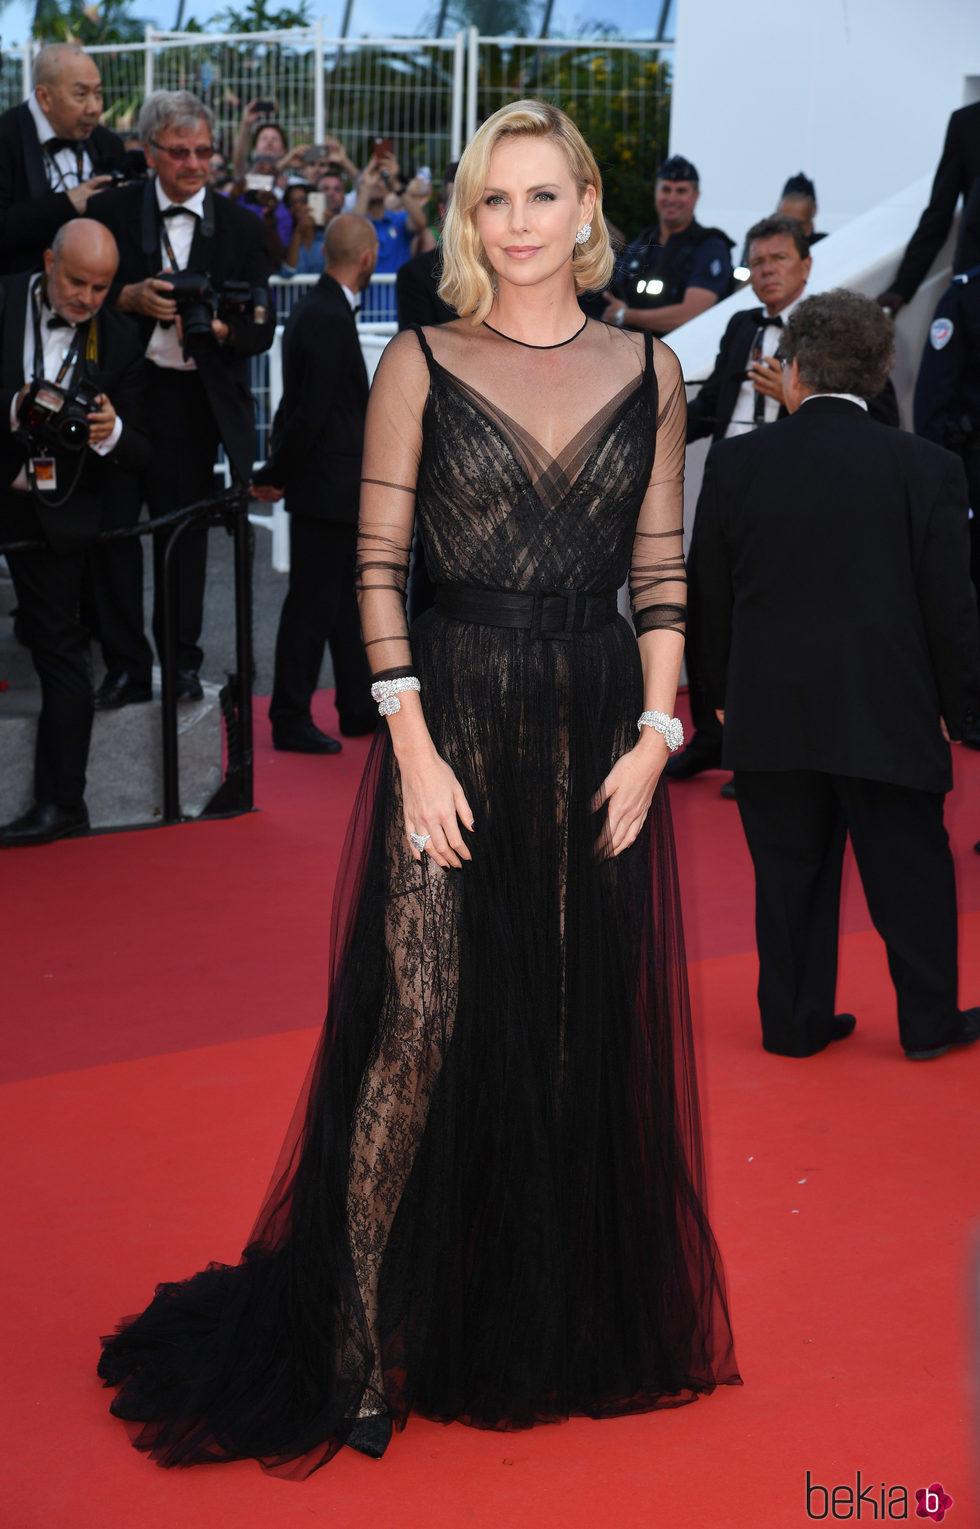 Chalize Theron opta por un maravilloso diseño de Dior